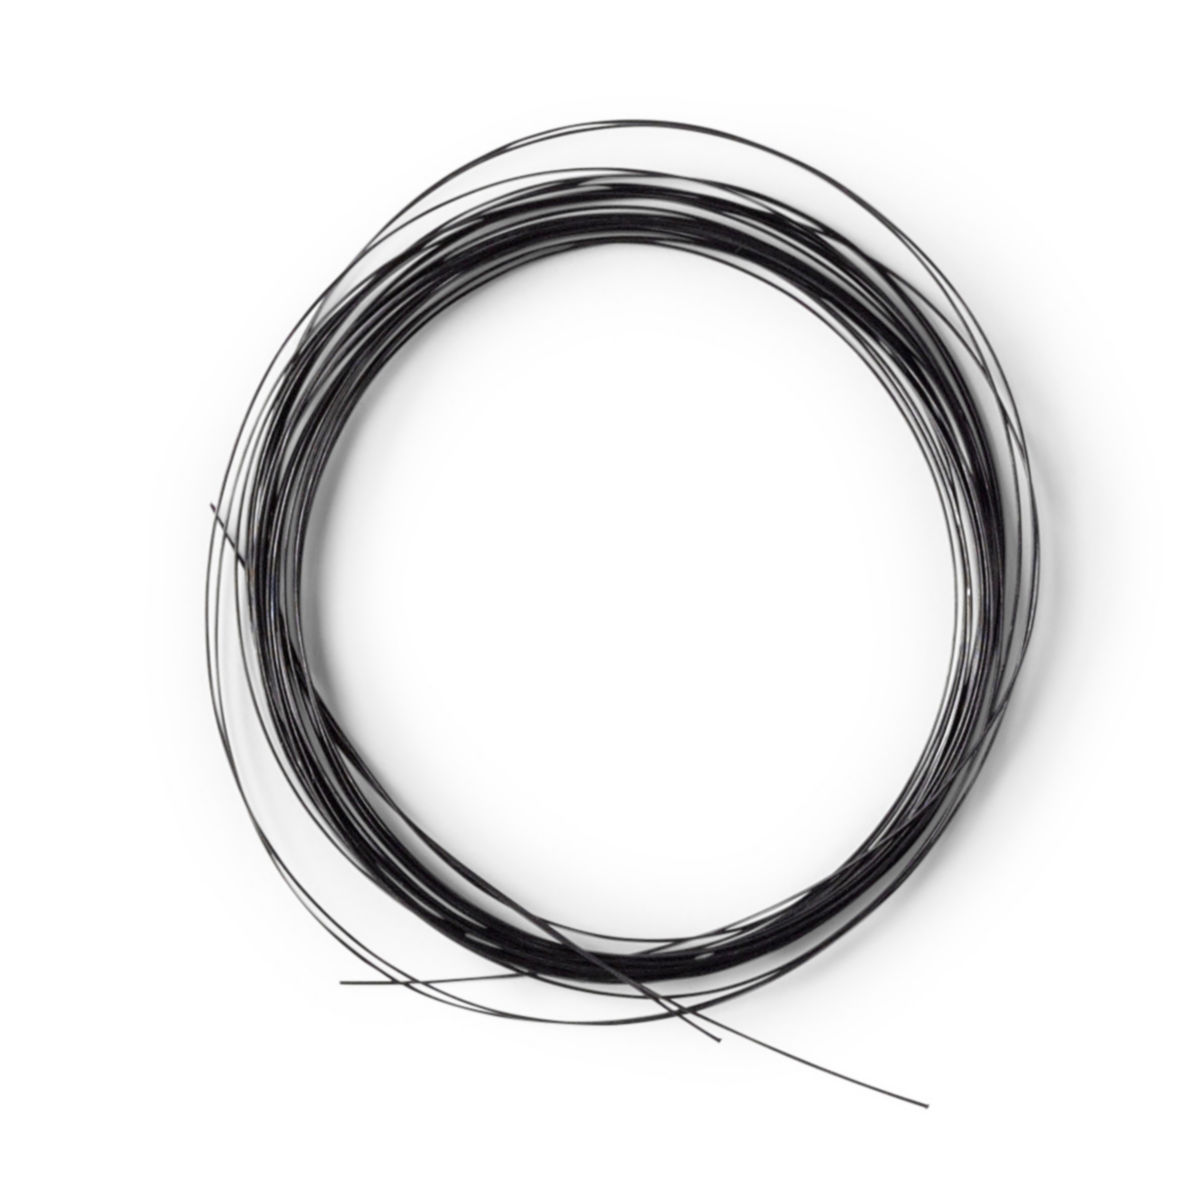 Senyo's Intruder Trailer Wire - image number 0